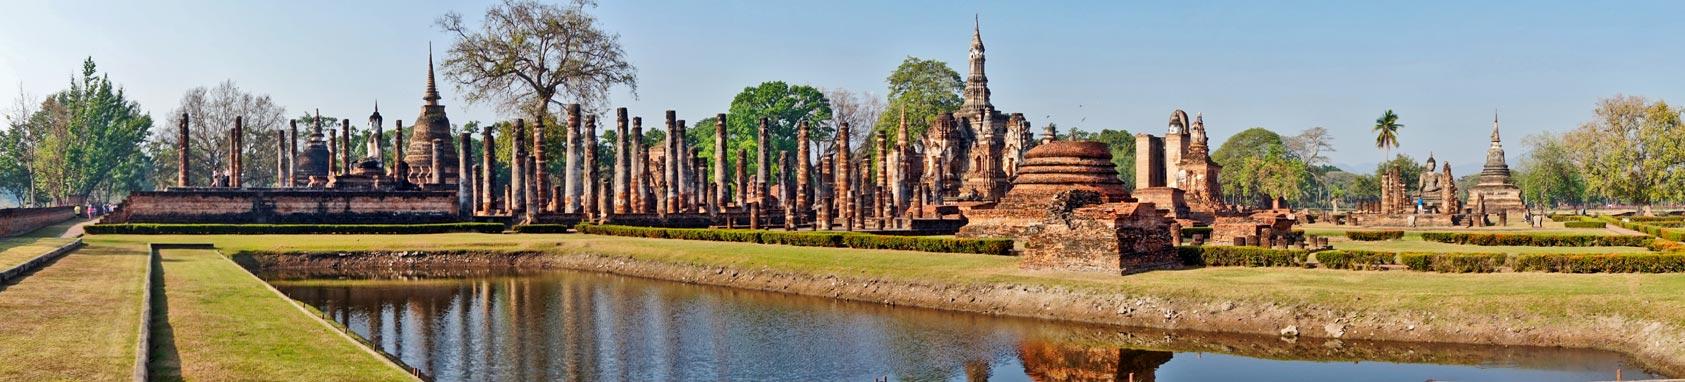 Parque Histórico Sukhothai panorámica